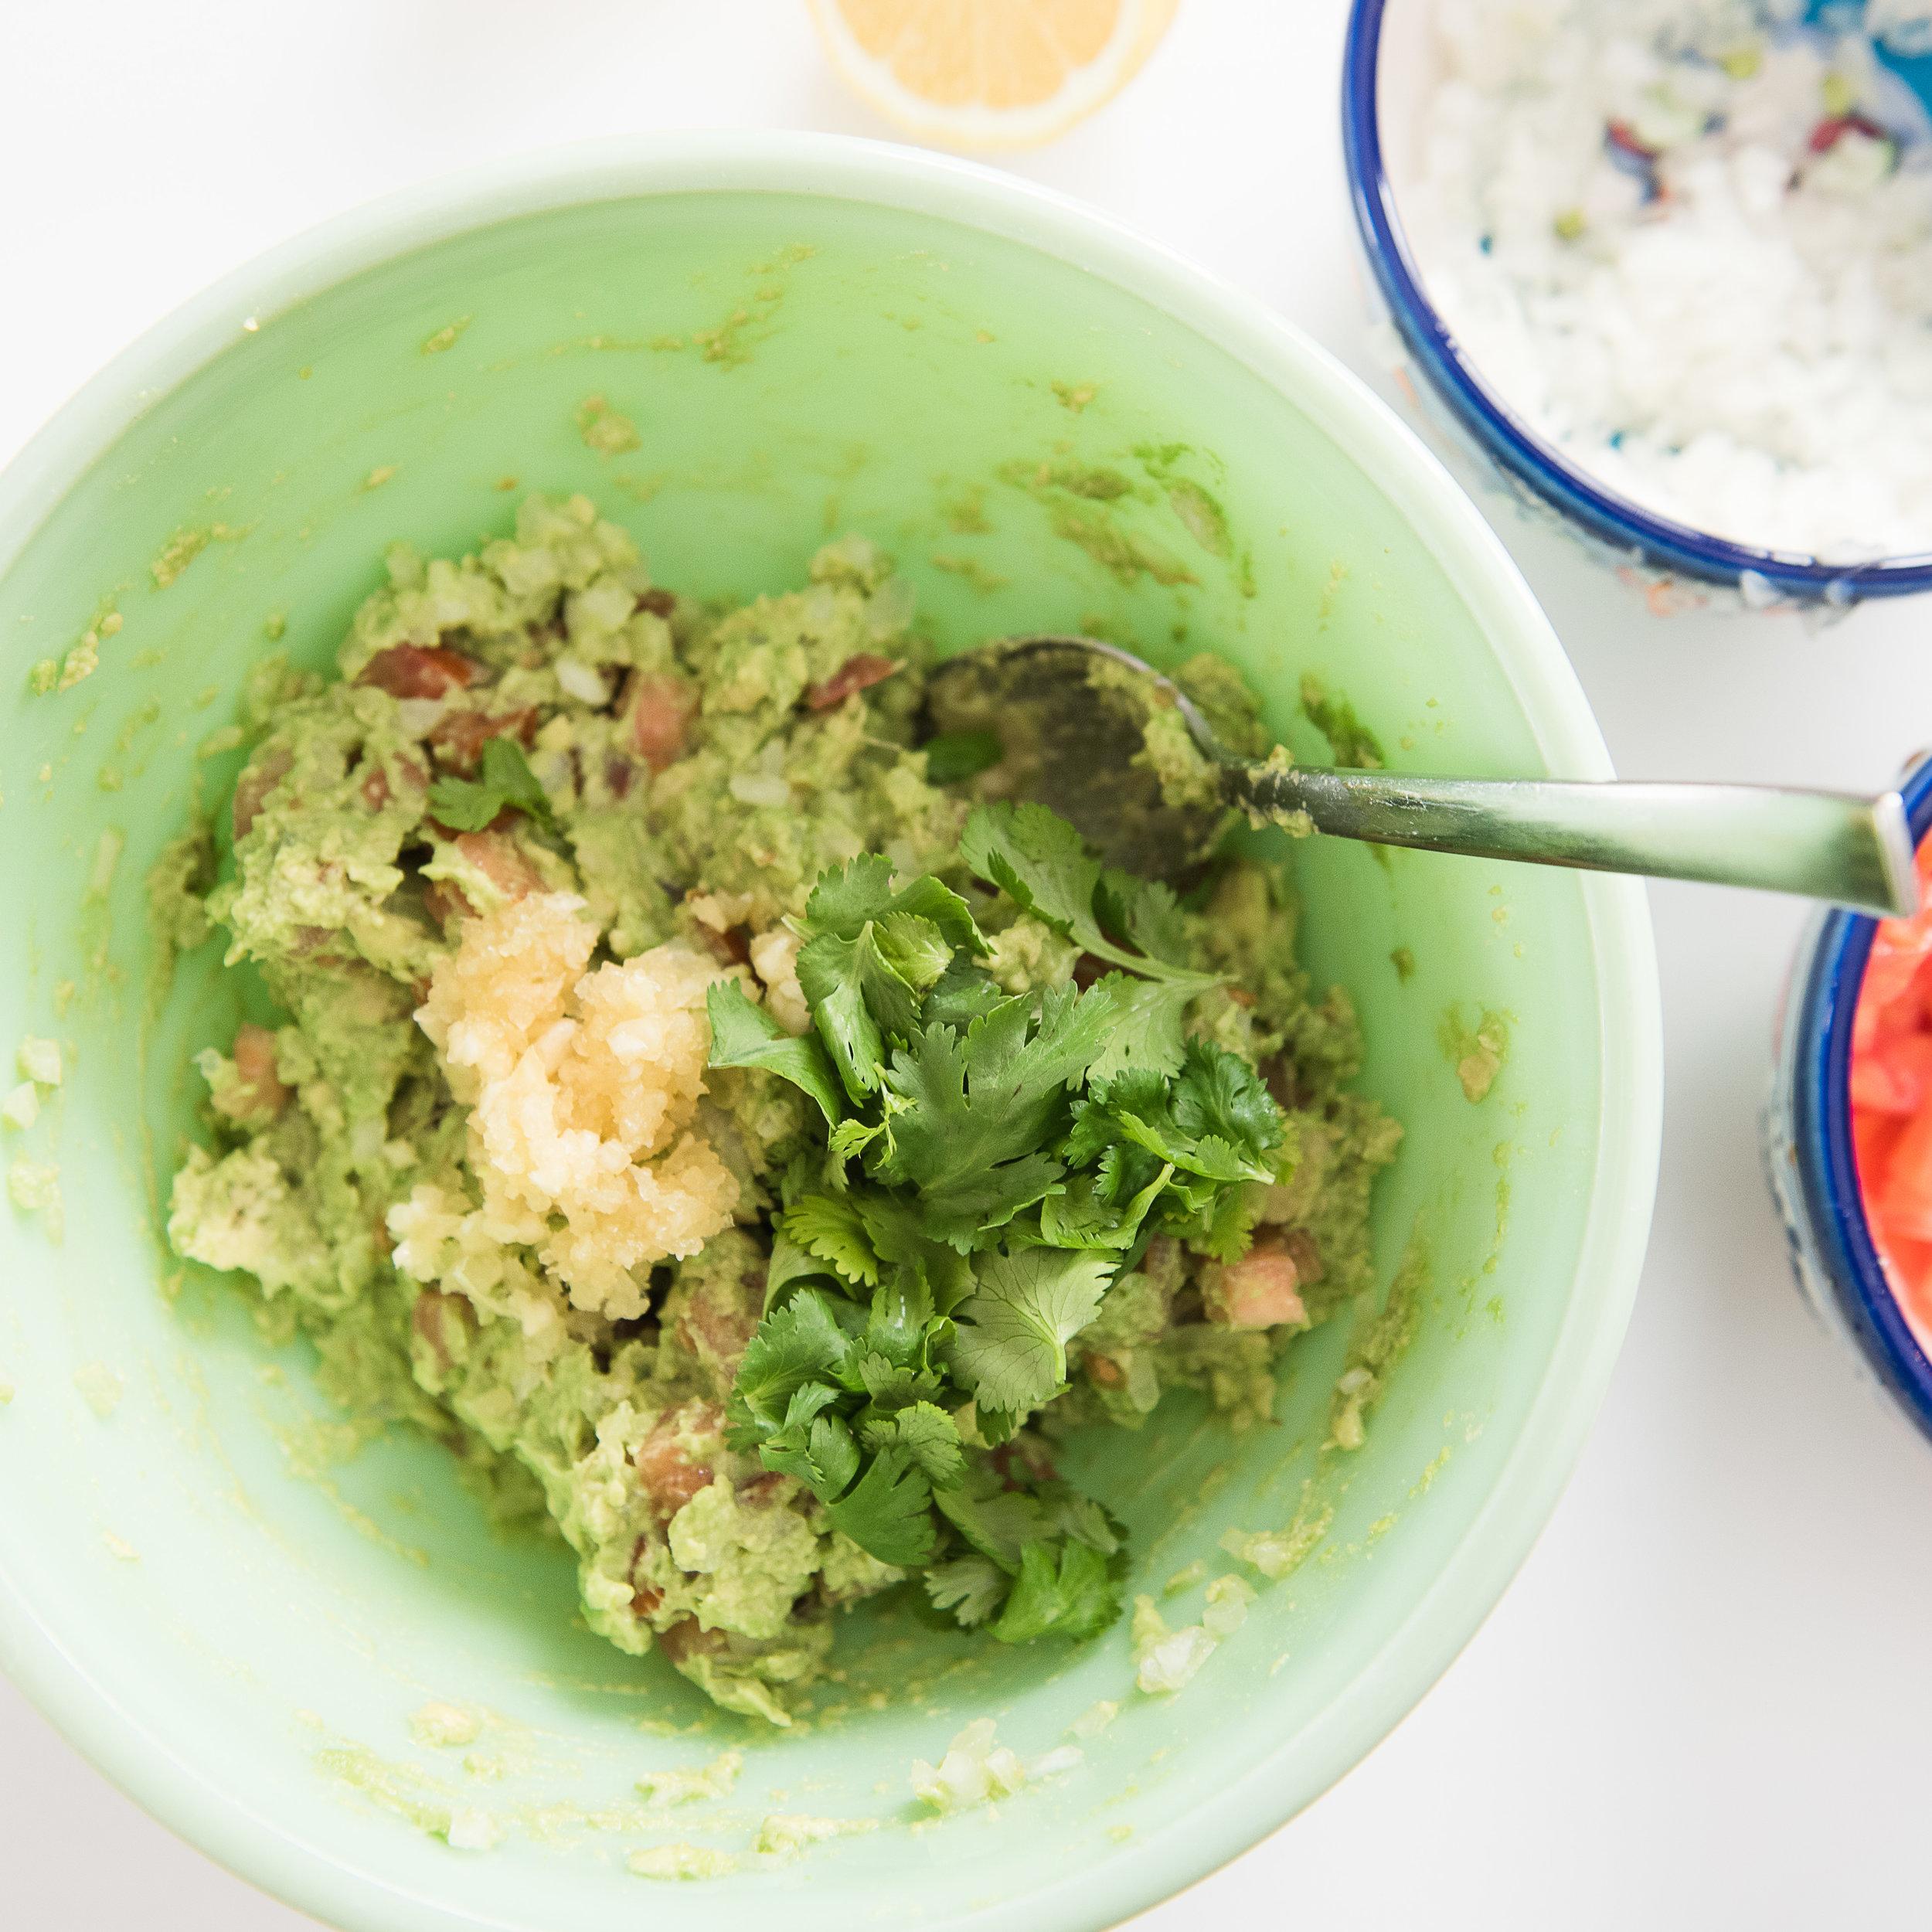 mexican-food-appetizer-easy-guacamole-karina-mora-prints-3.jpg